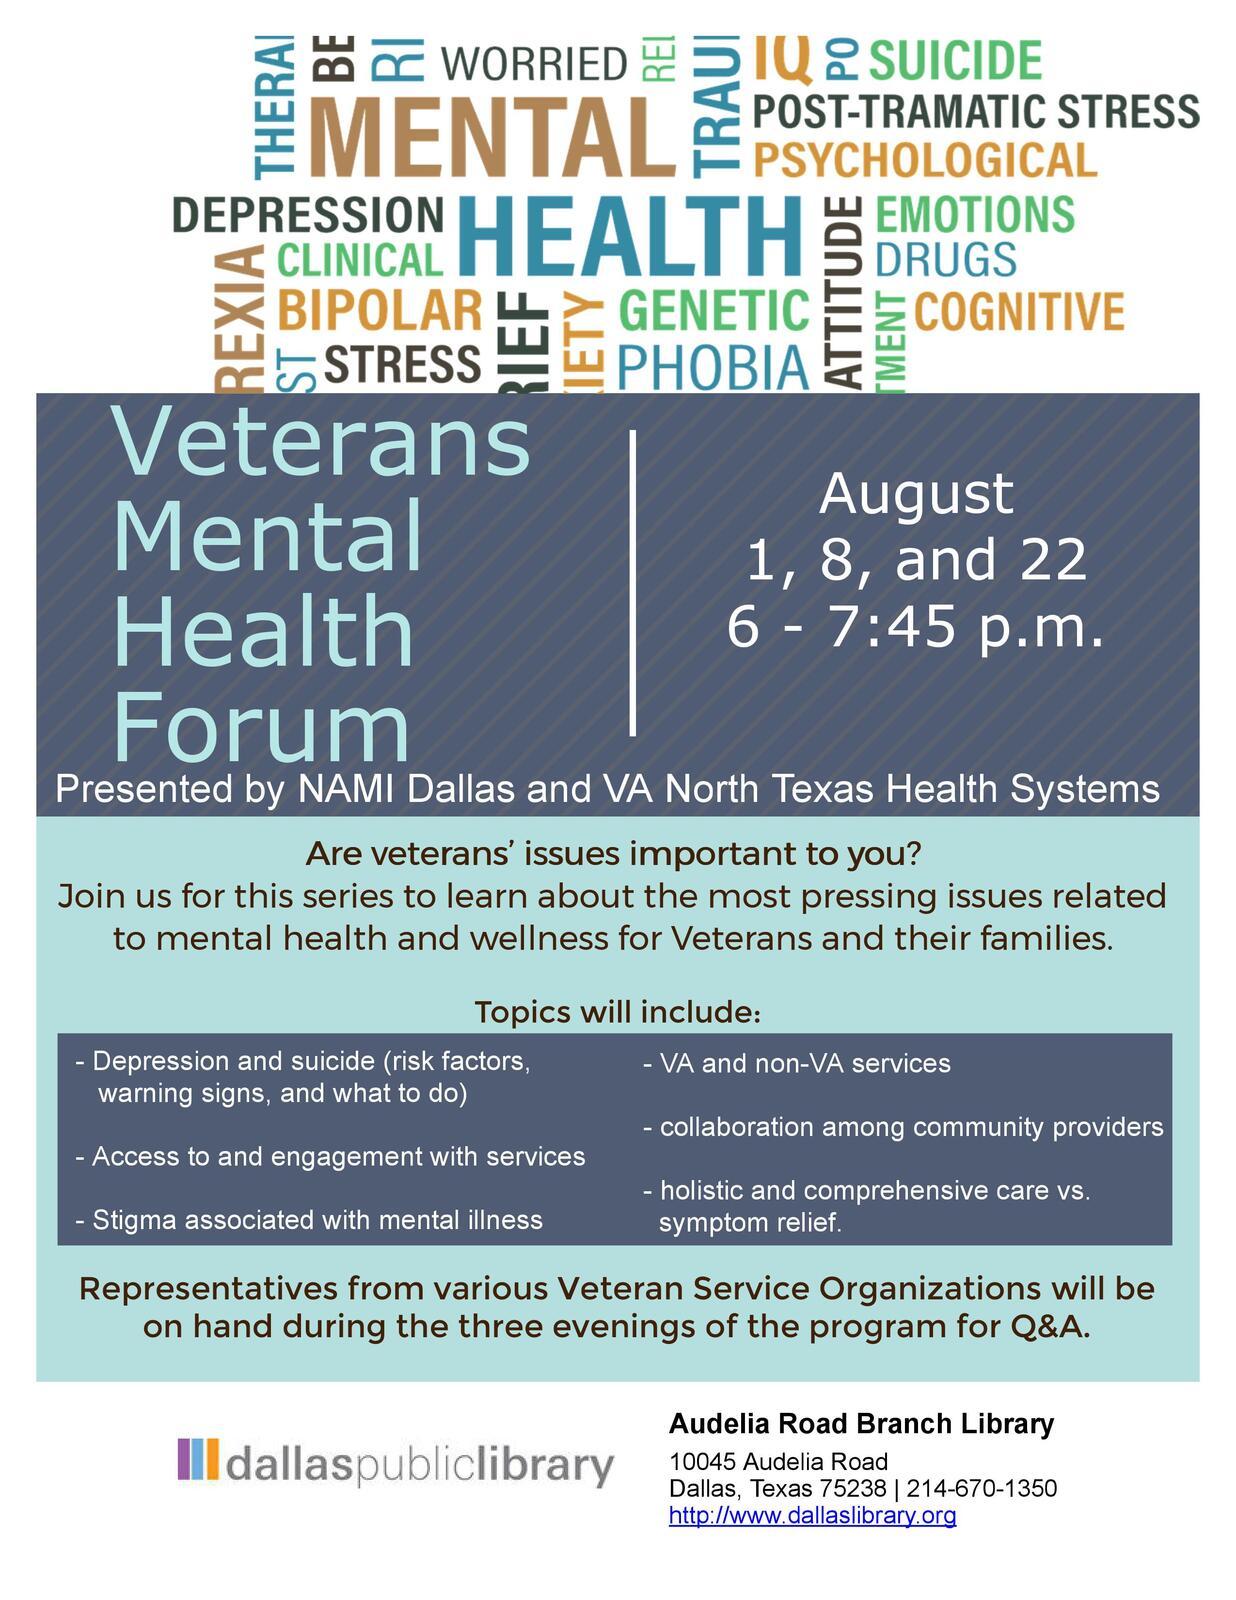 TONIGHT- Veterans' Mental Health Forum at Audelia Road